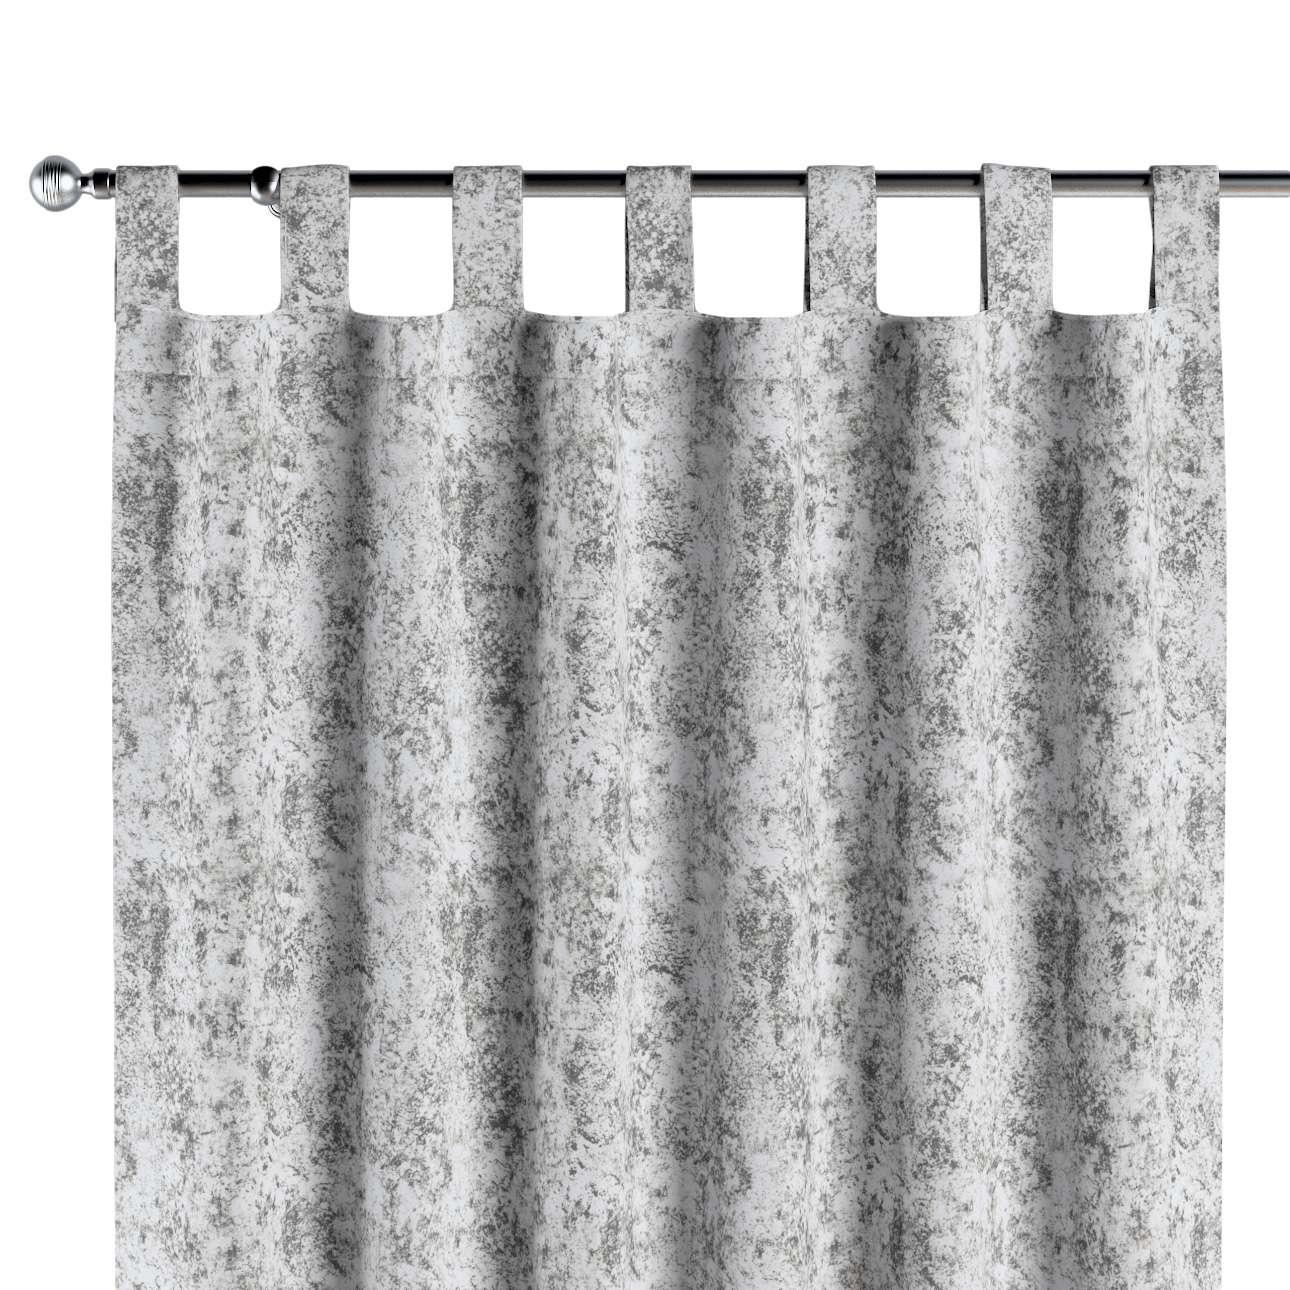 Zasłona na szelkach 1 szt. w kolekcji Velvet, tkanina: 704-49